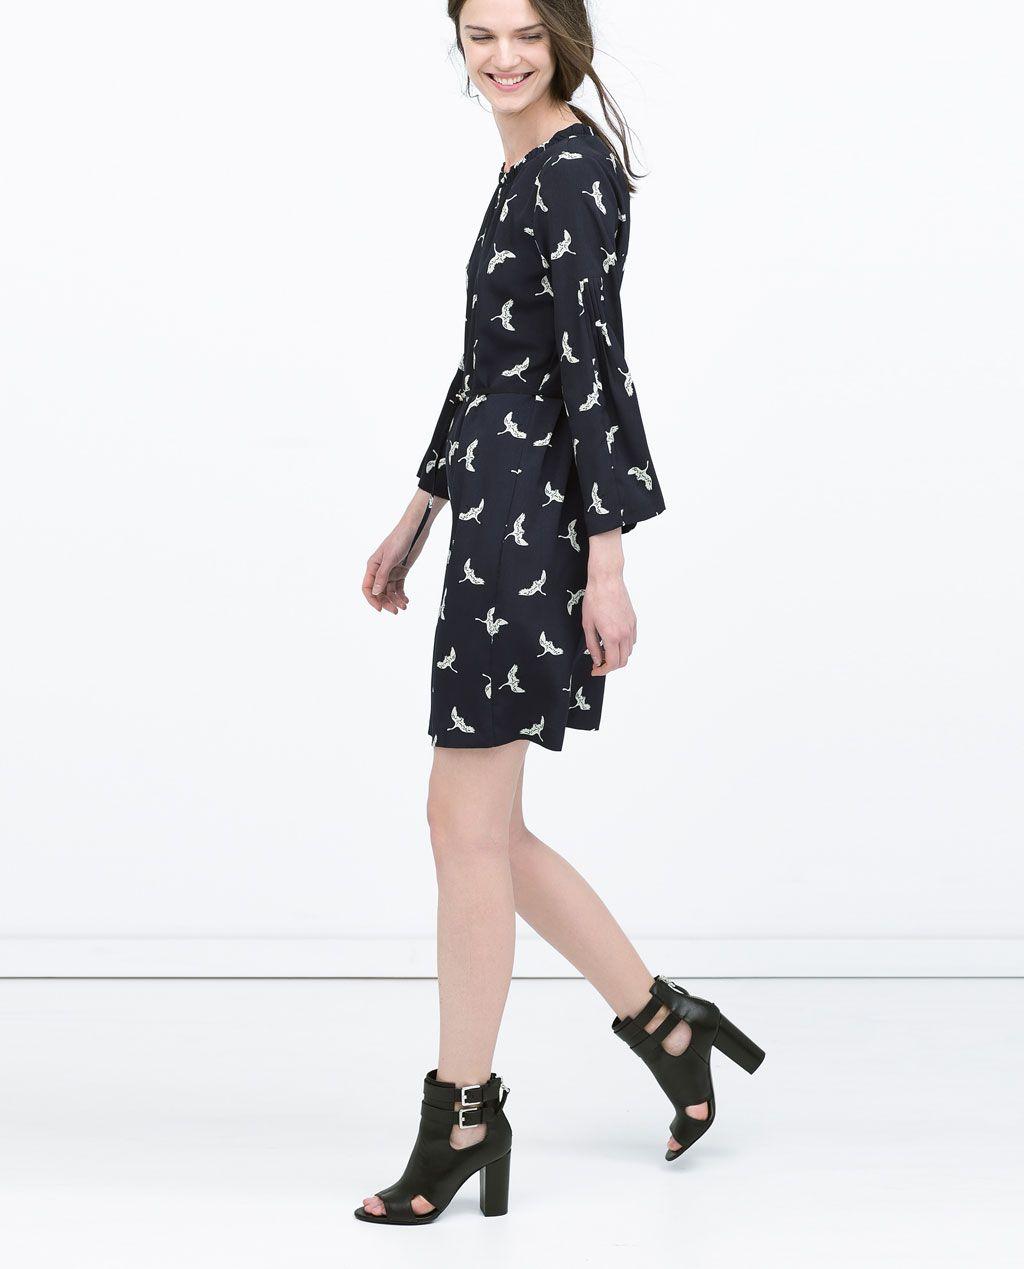 fd610000 CRANE PRINTED DRESS in navy blue from Zara | Dream Closet | Dresses ...